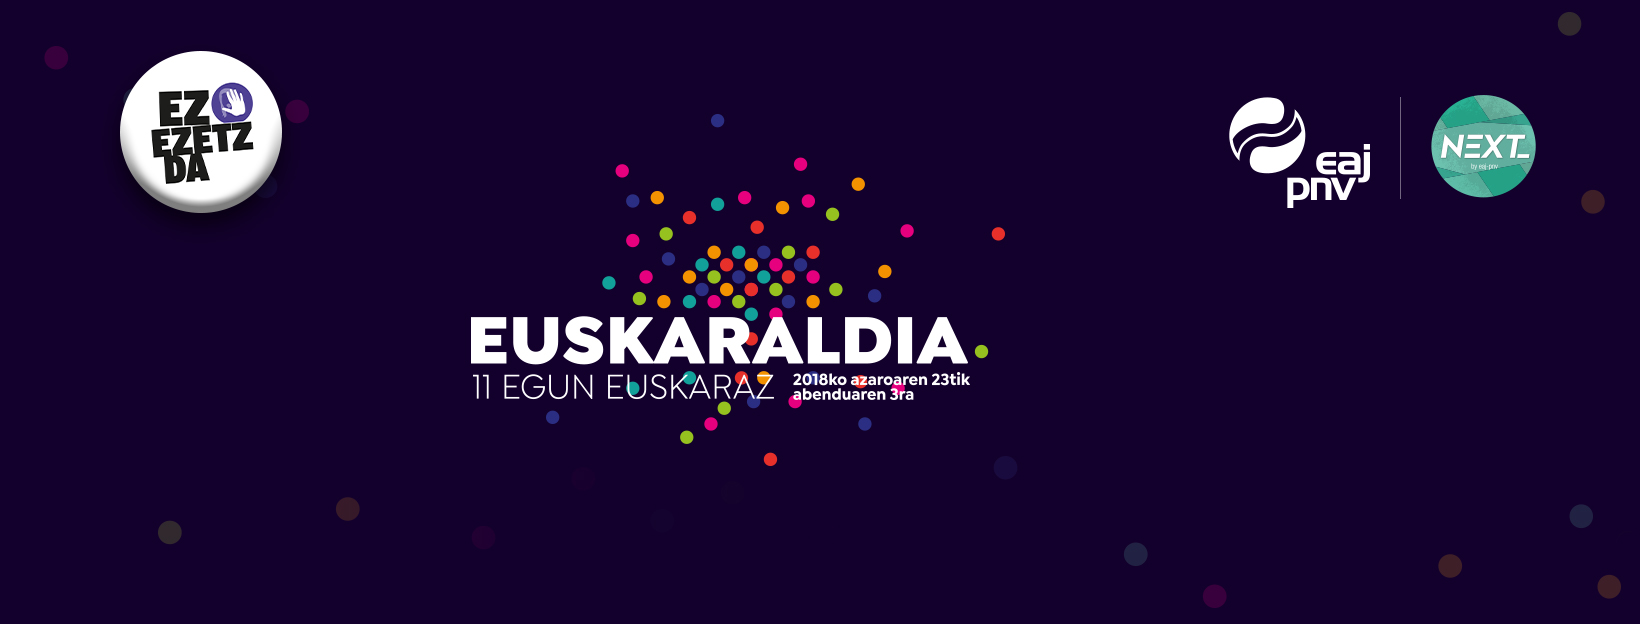 Euskaraldia 4